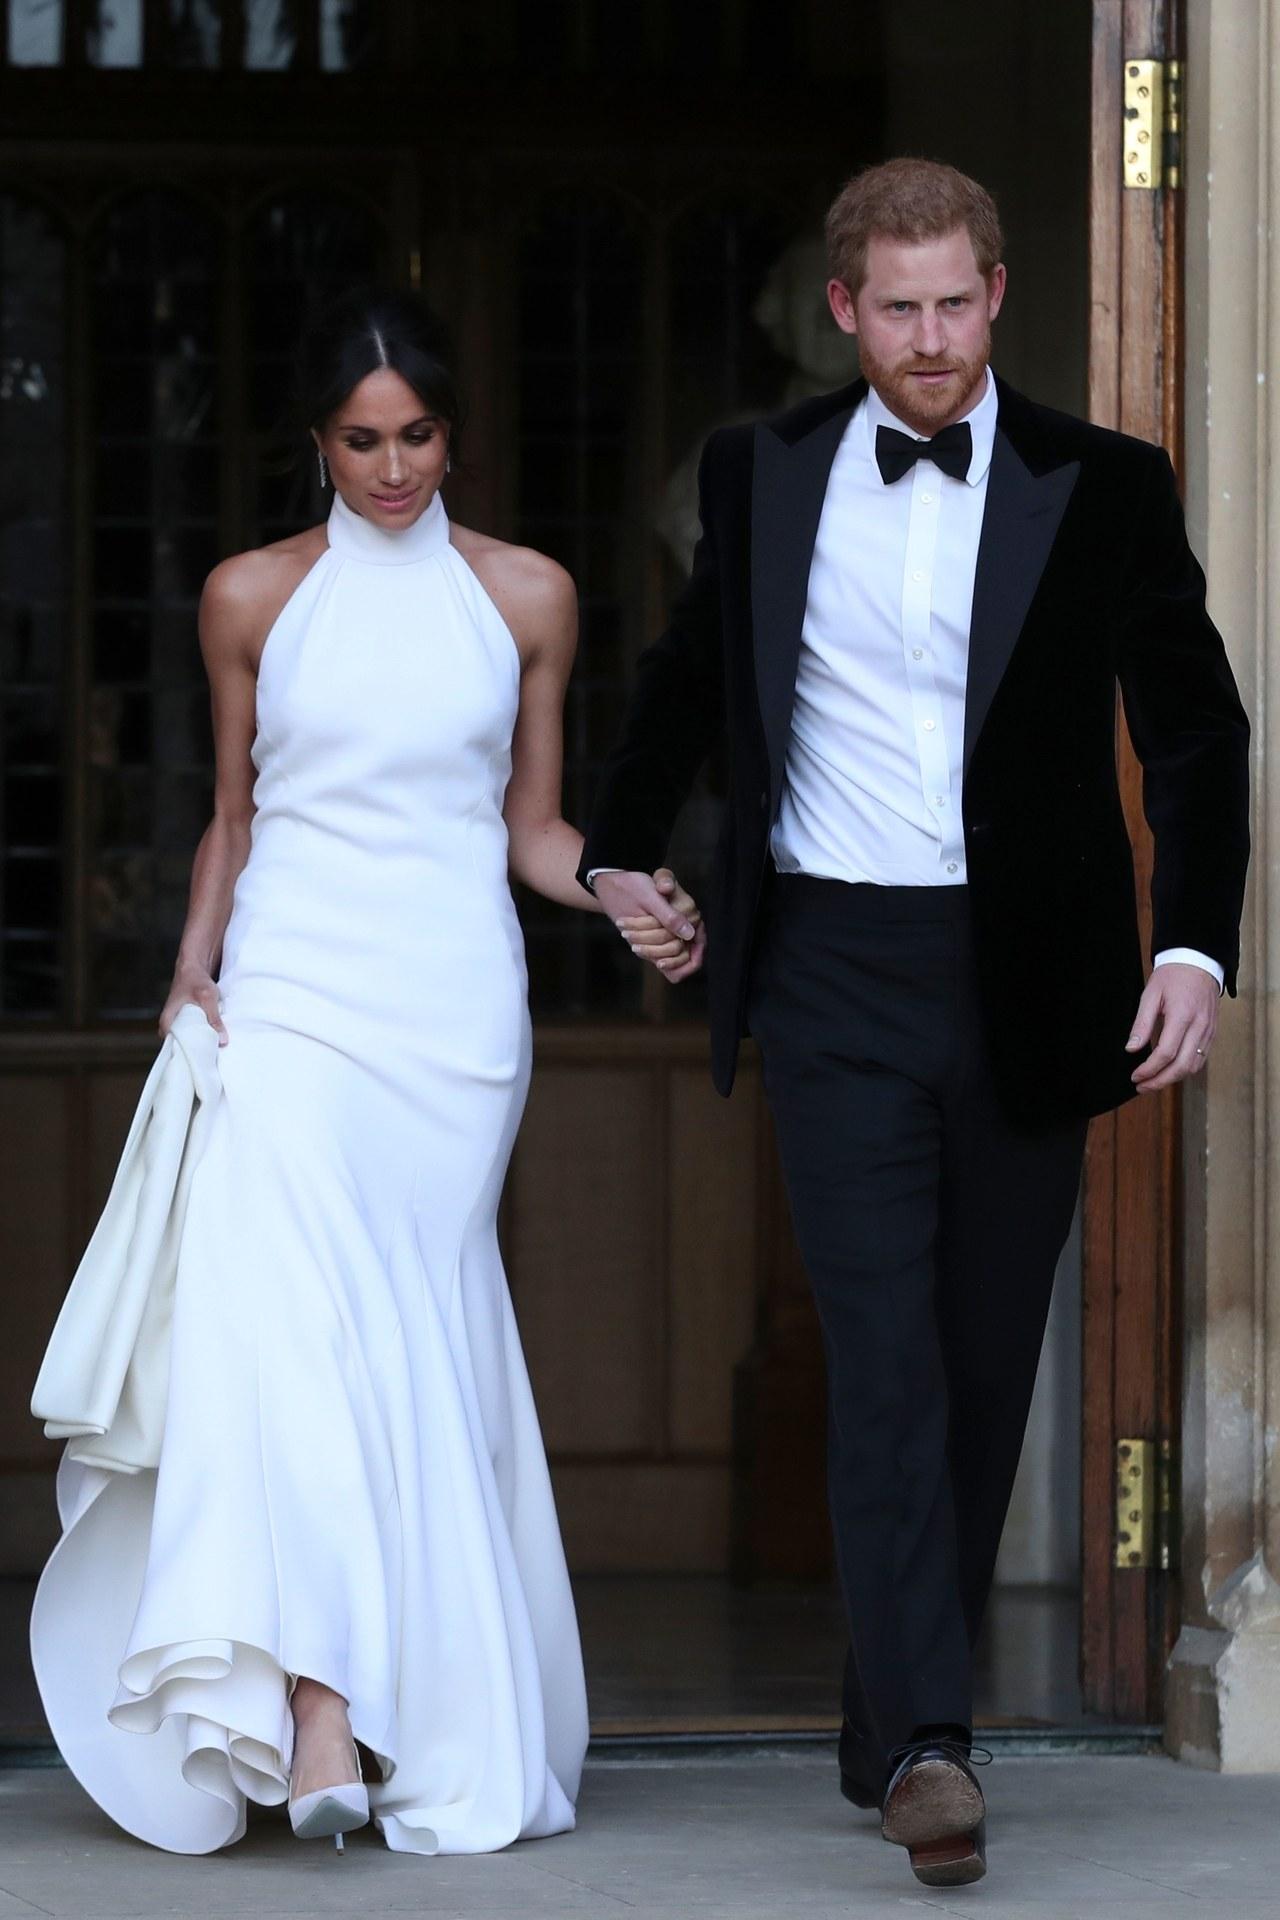 Meghan Markle reception wedding gown influential wedding 2018